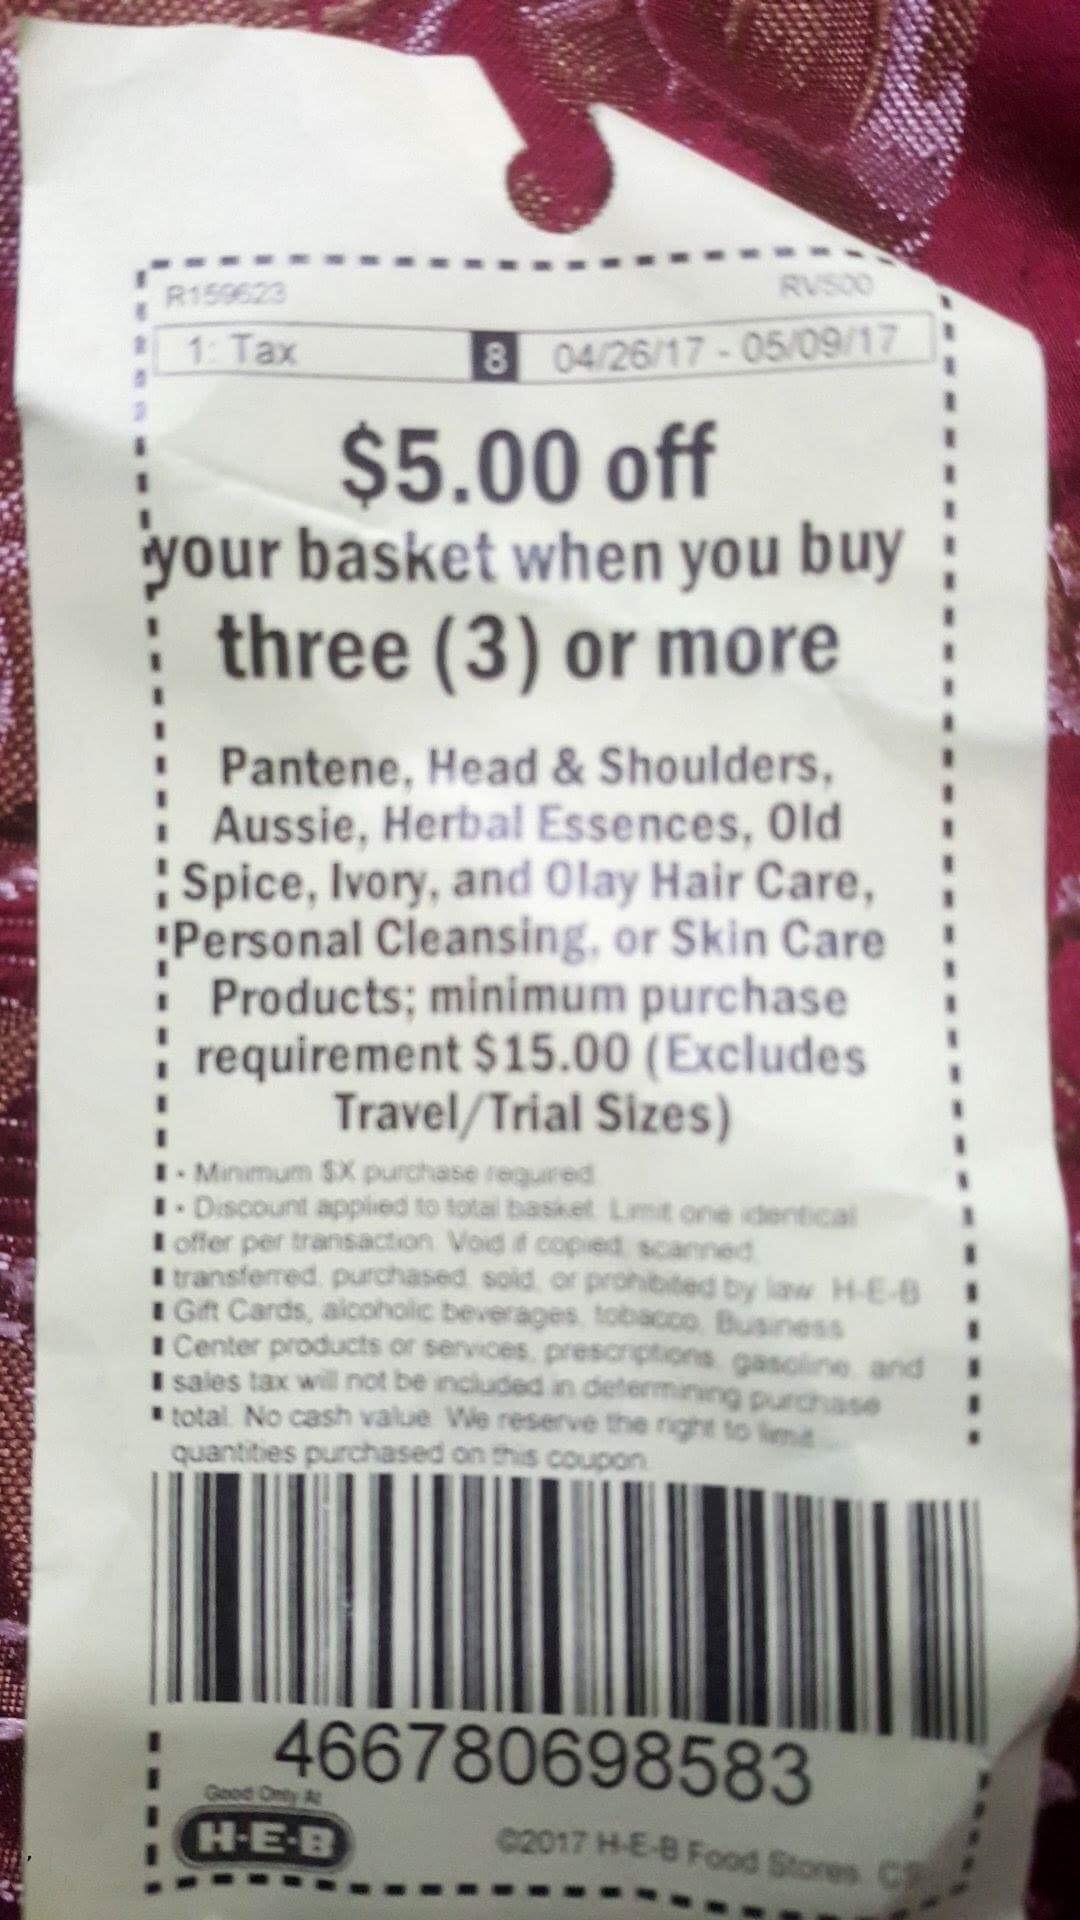 photograph regarding Pantene Coupons Printable named Pantene hair treatment $1.78 a bottle @ HEB! Couponing Weblogs